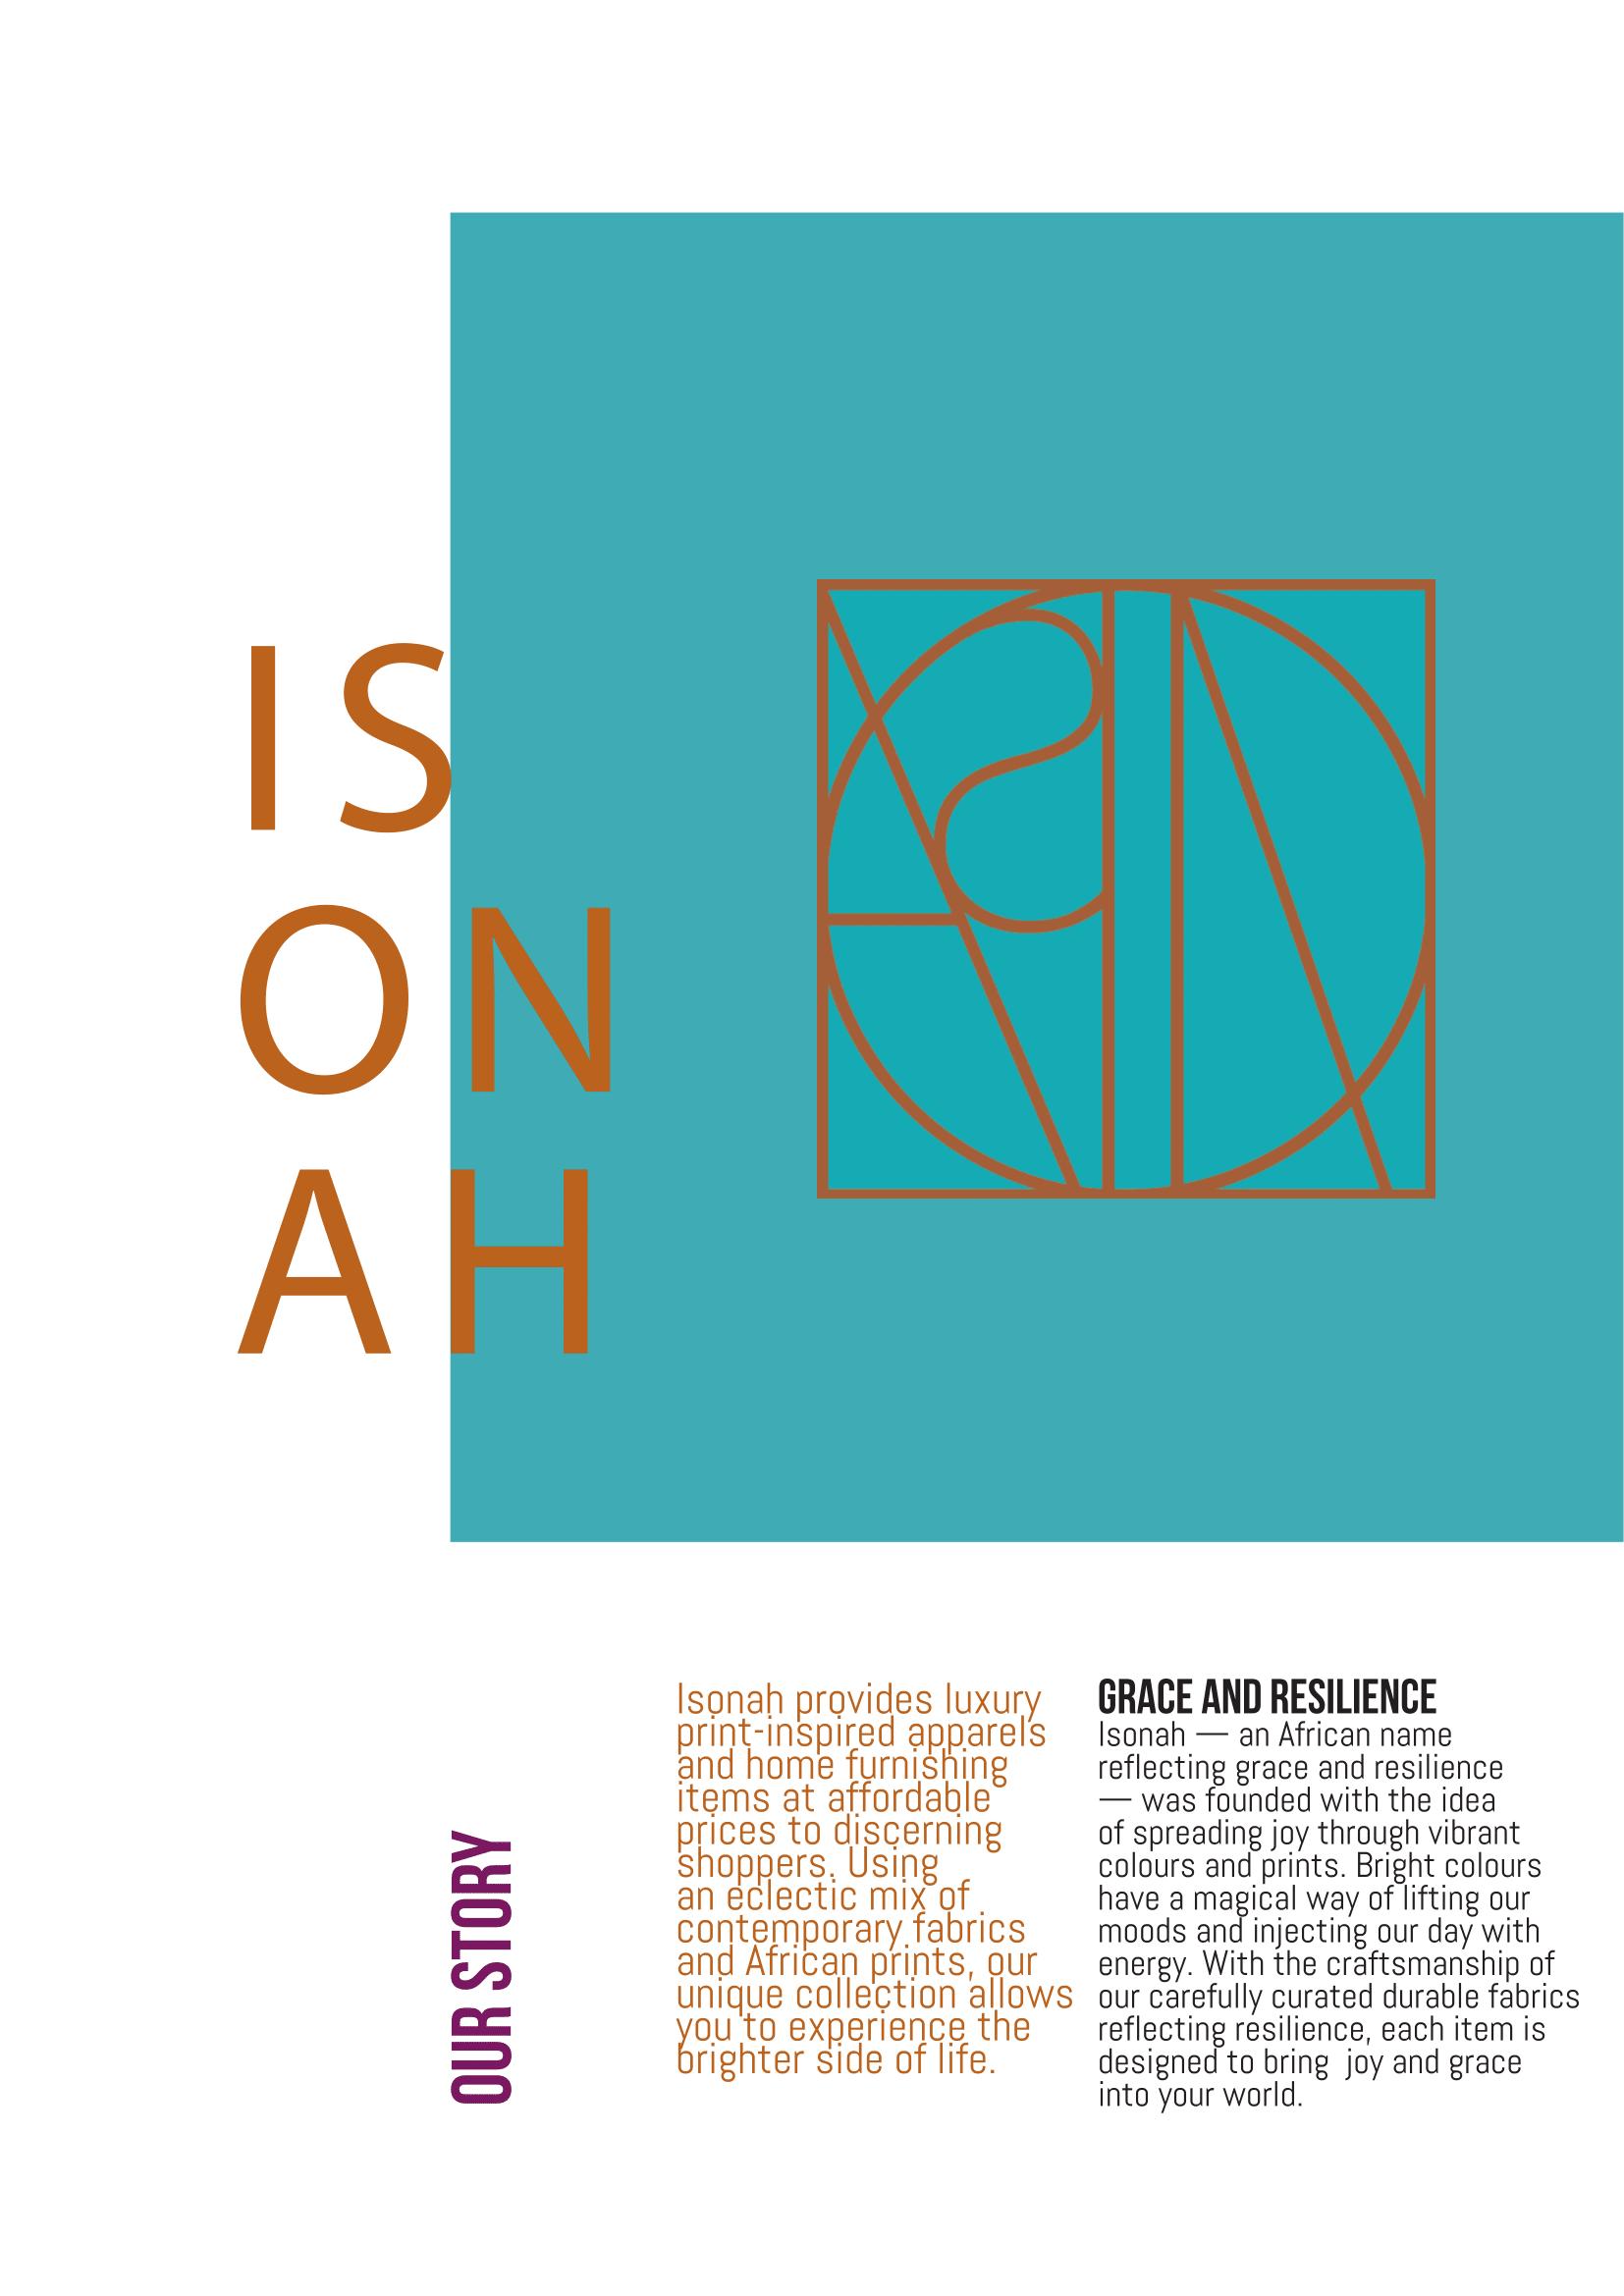 Isonah copy 1